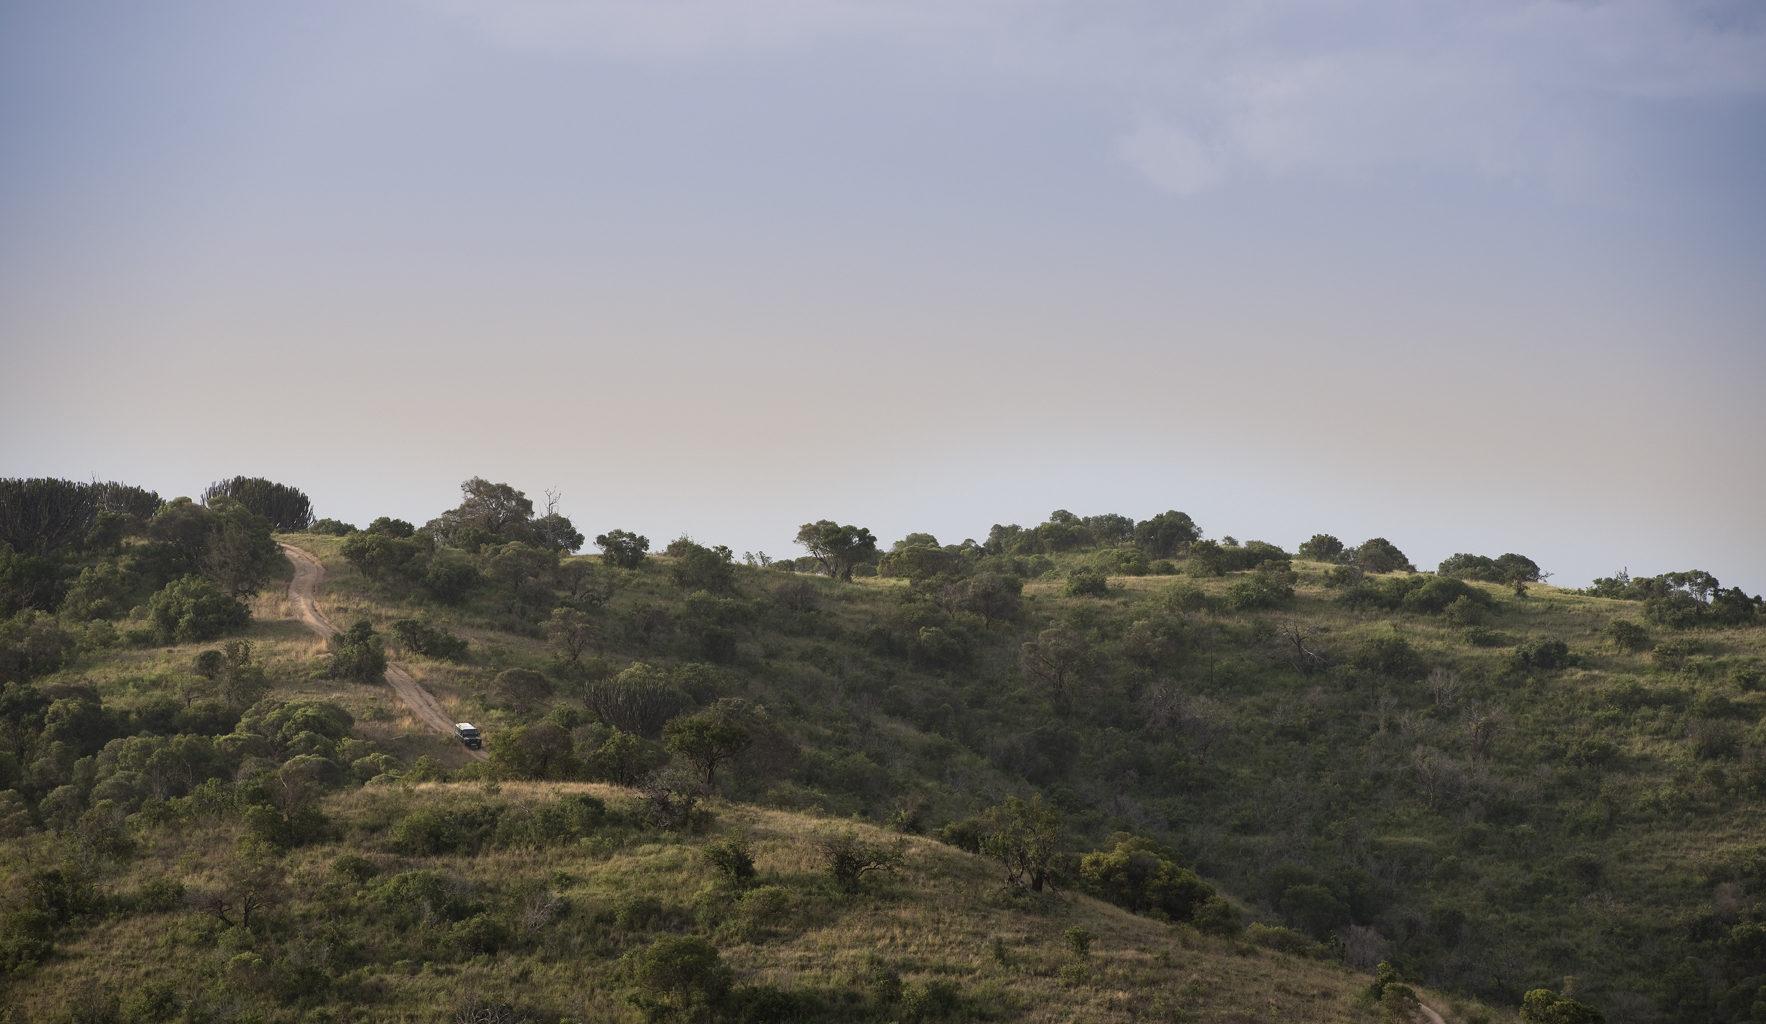 Sirai Kenya Landscape